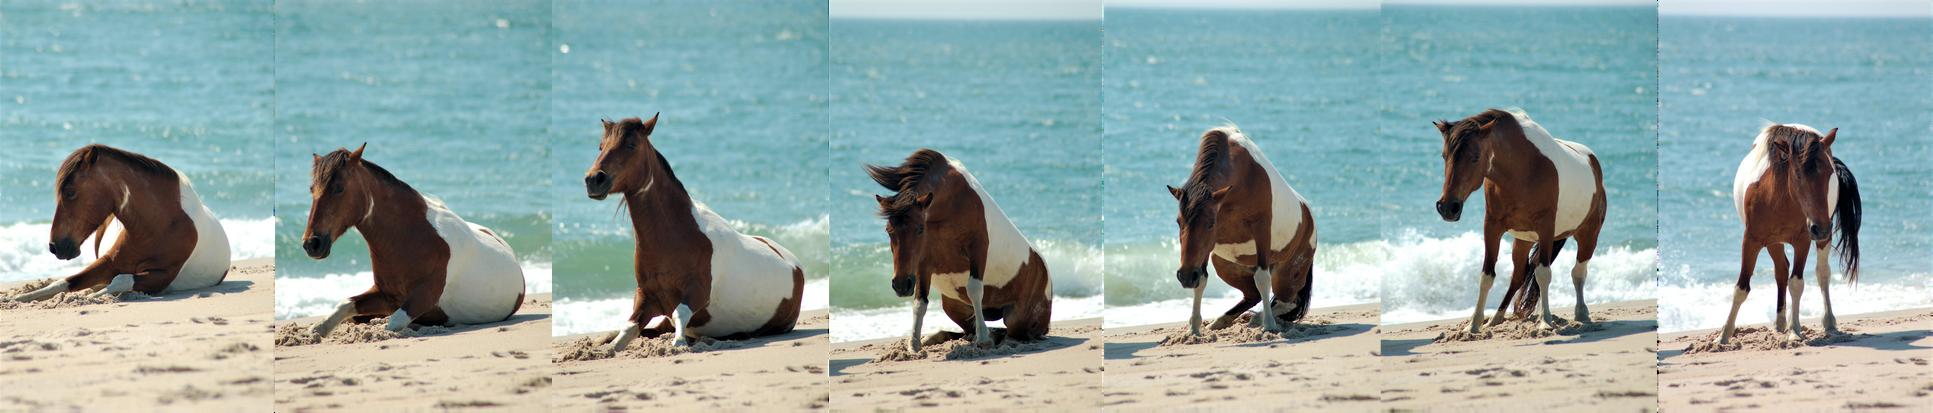 Horse Stock 14 by Jaded-Night-Stock